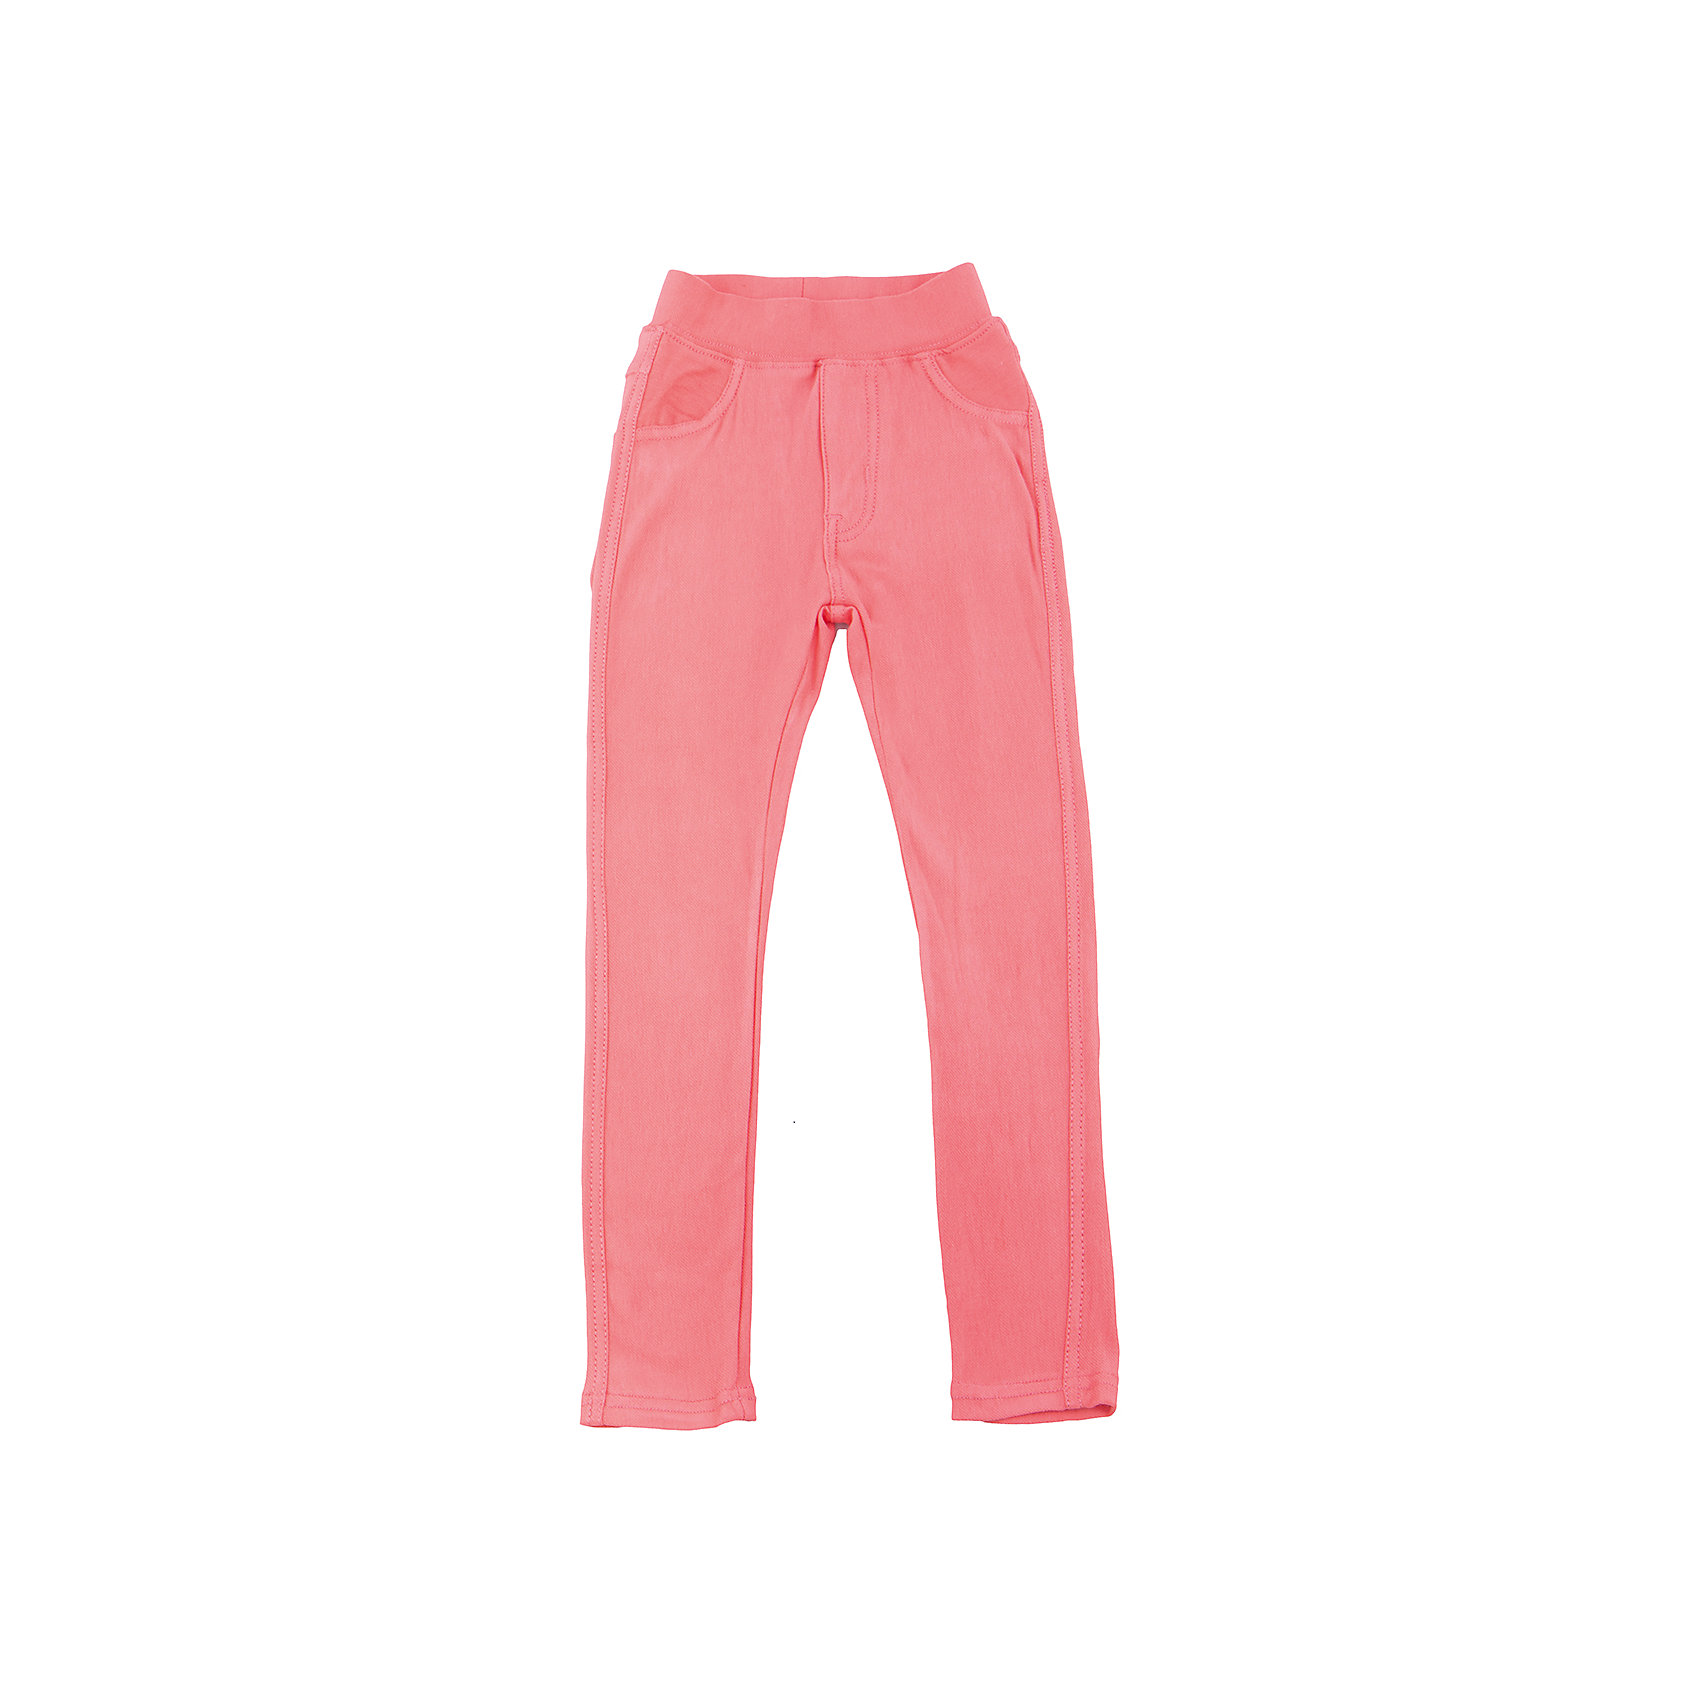 Леггинсы для девочки Sweet BerryТрикотажные брюки-джеггинсыдля девочки. Модель зауженного кроя. Два накладных кармана сзади.<br>Состав:<br>95%хлопок 5%эластан<br><br>Ширина мм: 123<br>Глубина мм: 10<br>Высота мм: 149<br>Вес г: 209<br>Цвет: оранжевый<br>Возраст от месяцев: 36<br>Возраст до месяцев: 48<br>Пол: Женский<br>Возраст: Детский<br>Размер: 104,98,110,116,122,128<br>SKU: 5412244